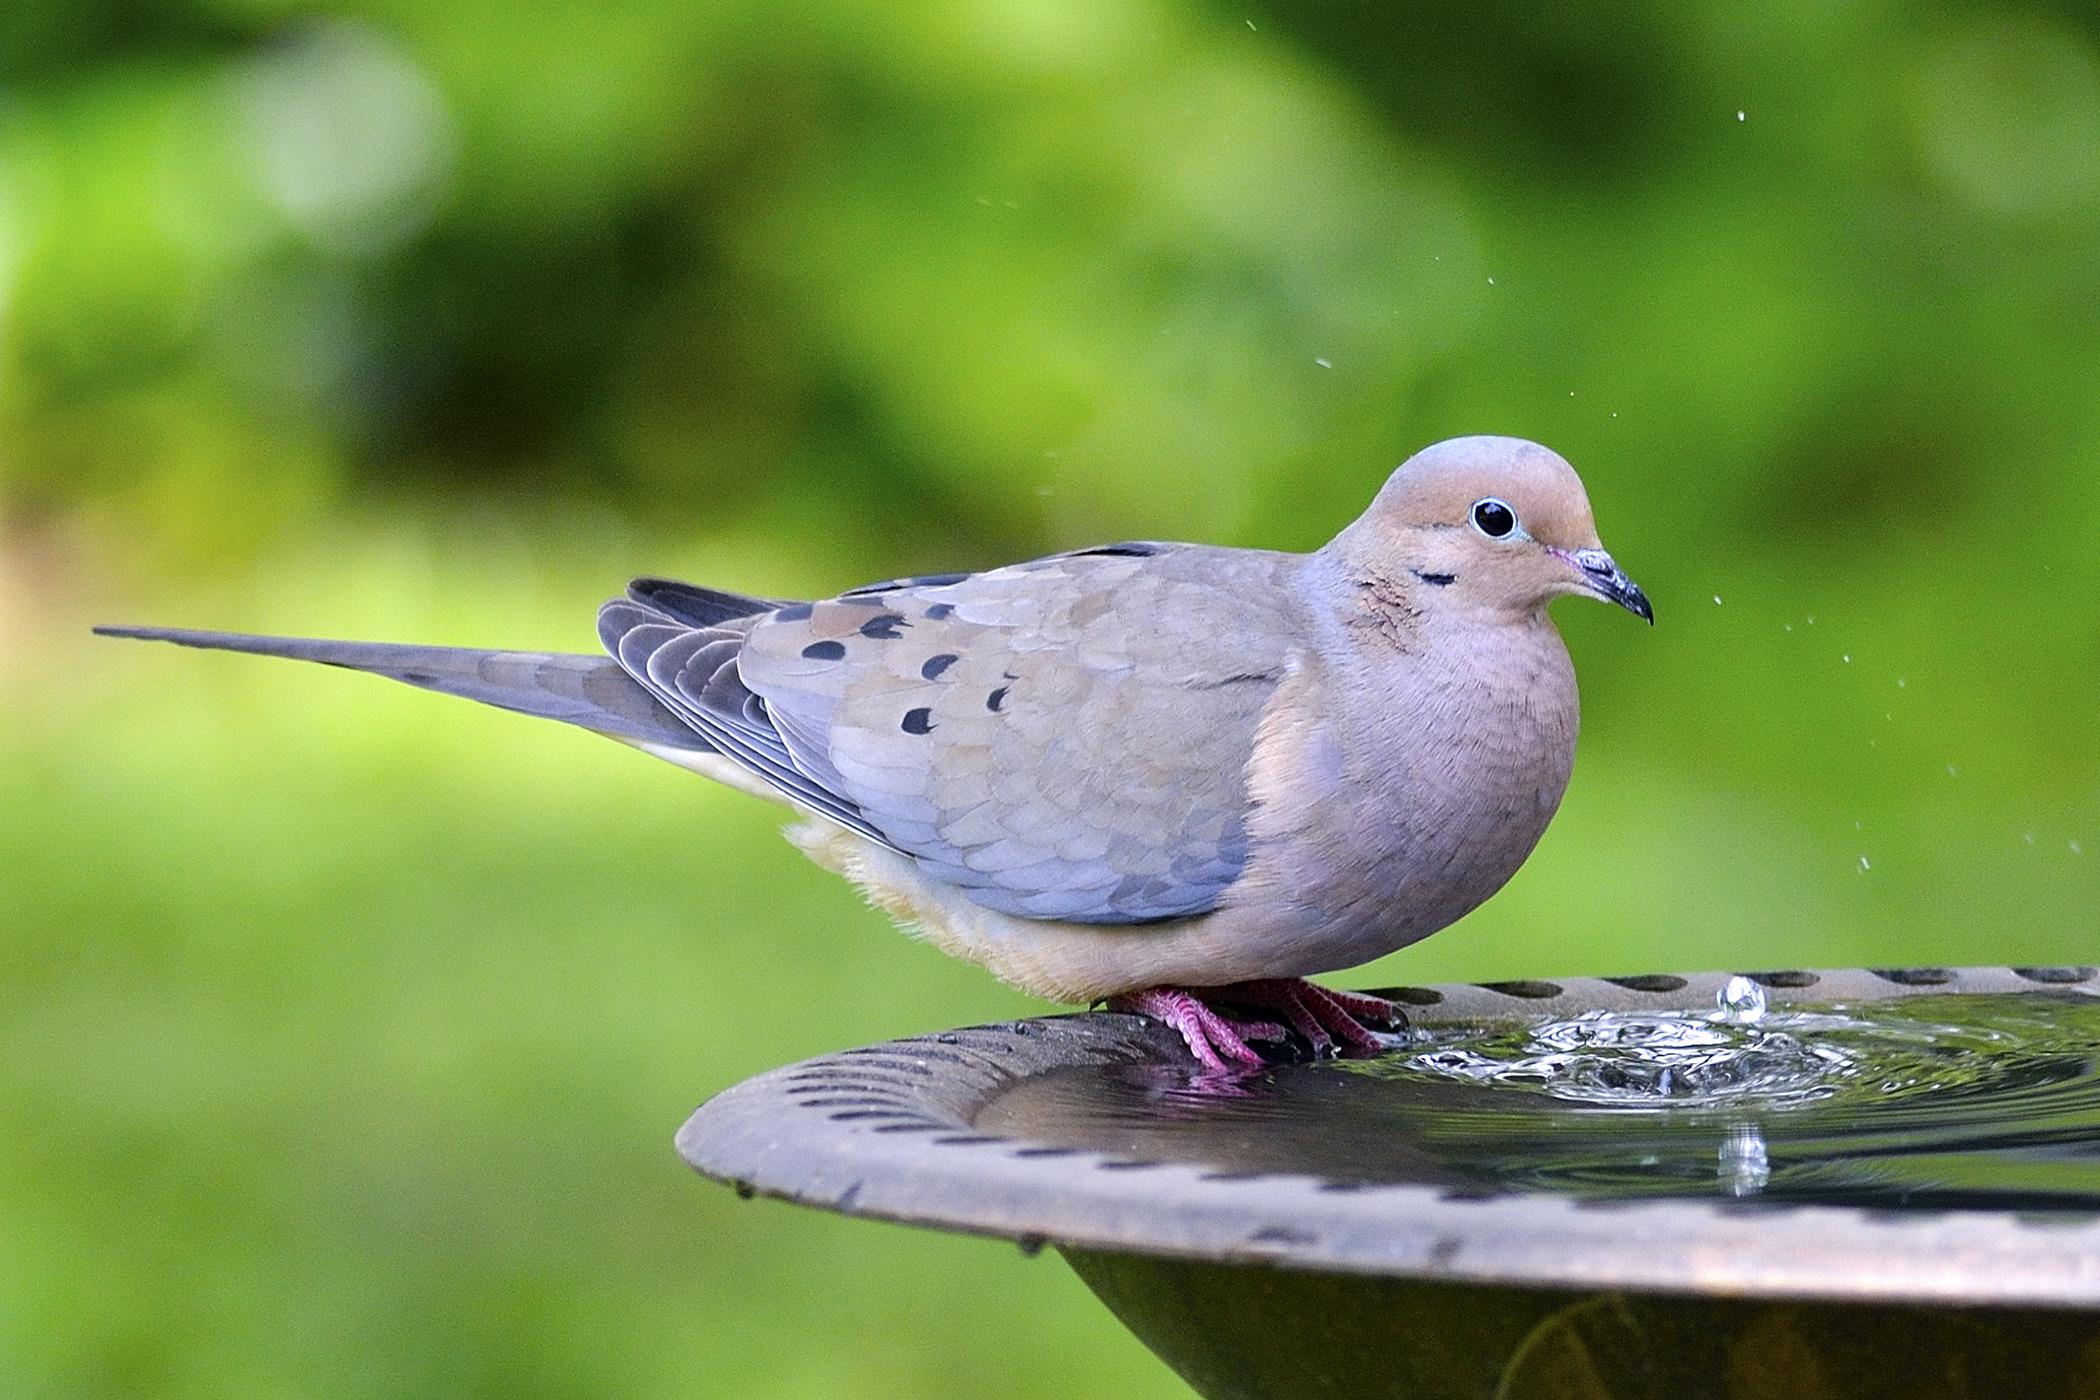 Scaly Leg Mite in Birds